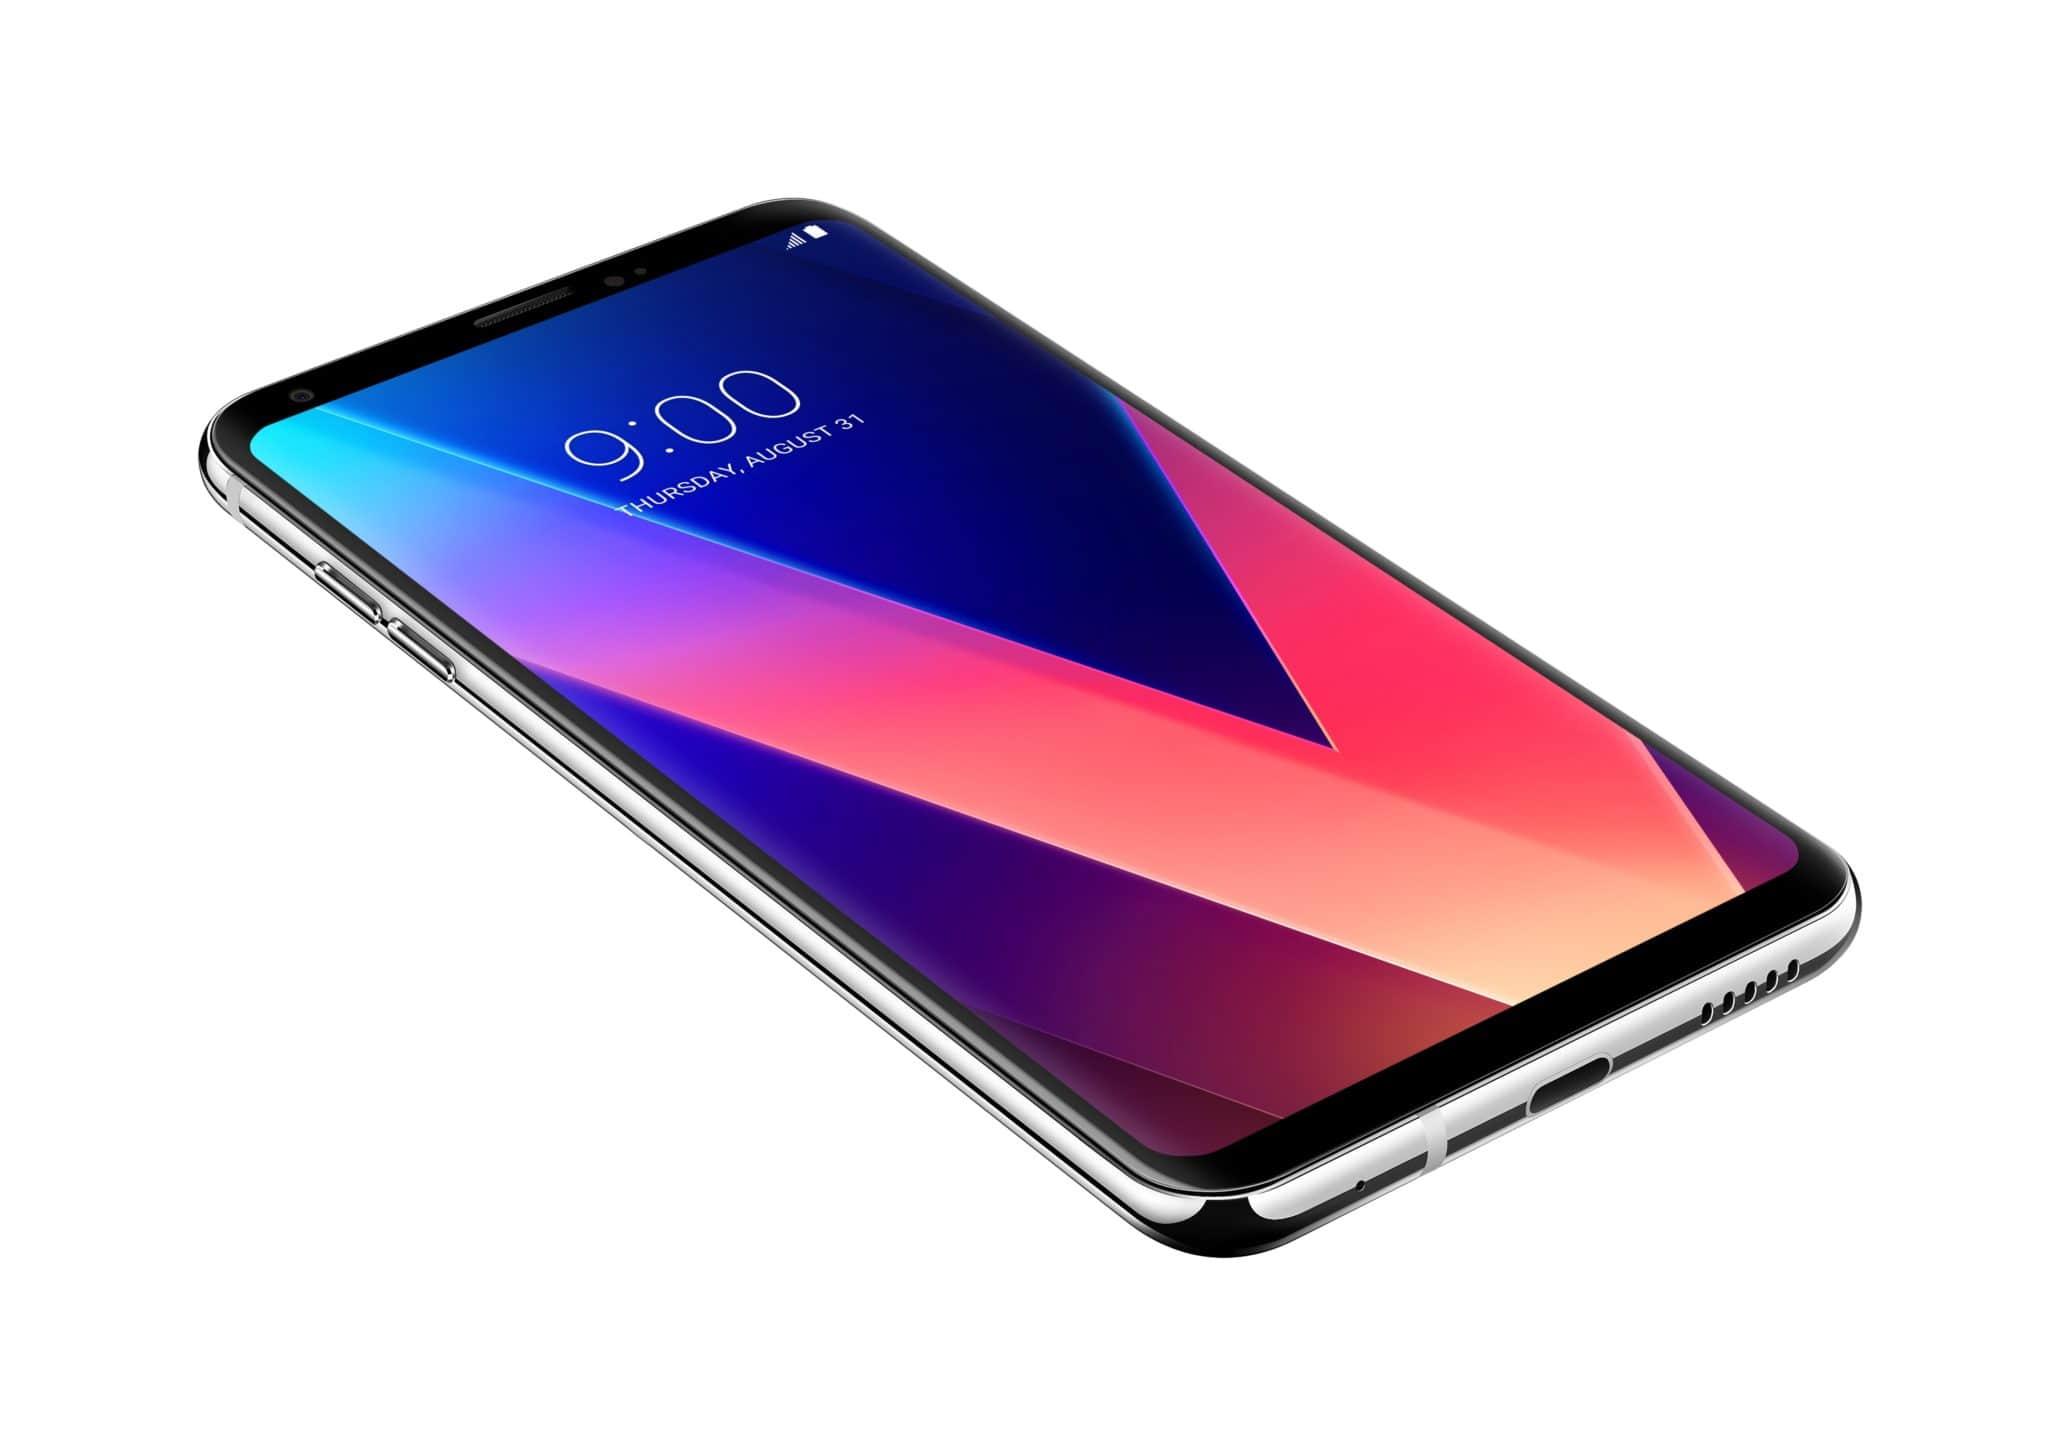 LG G7 design